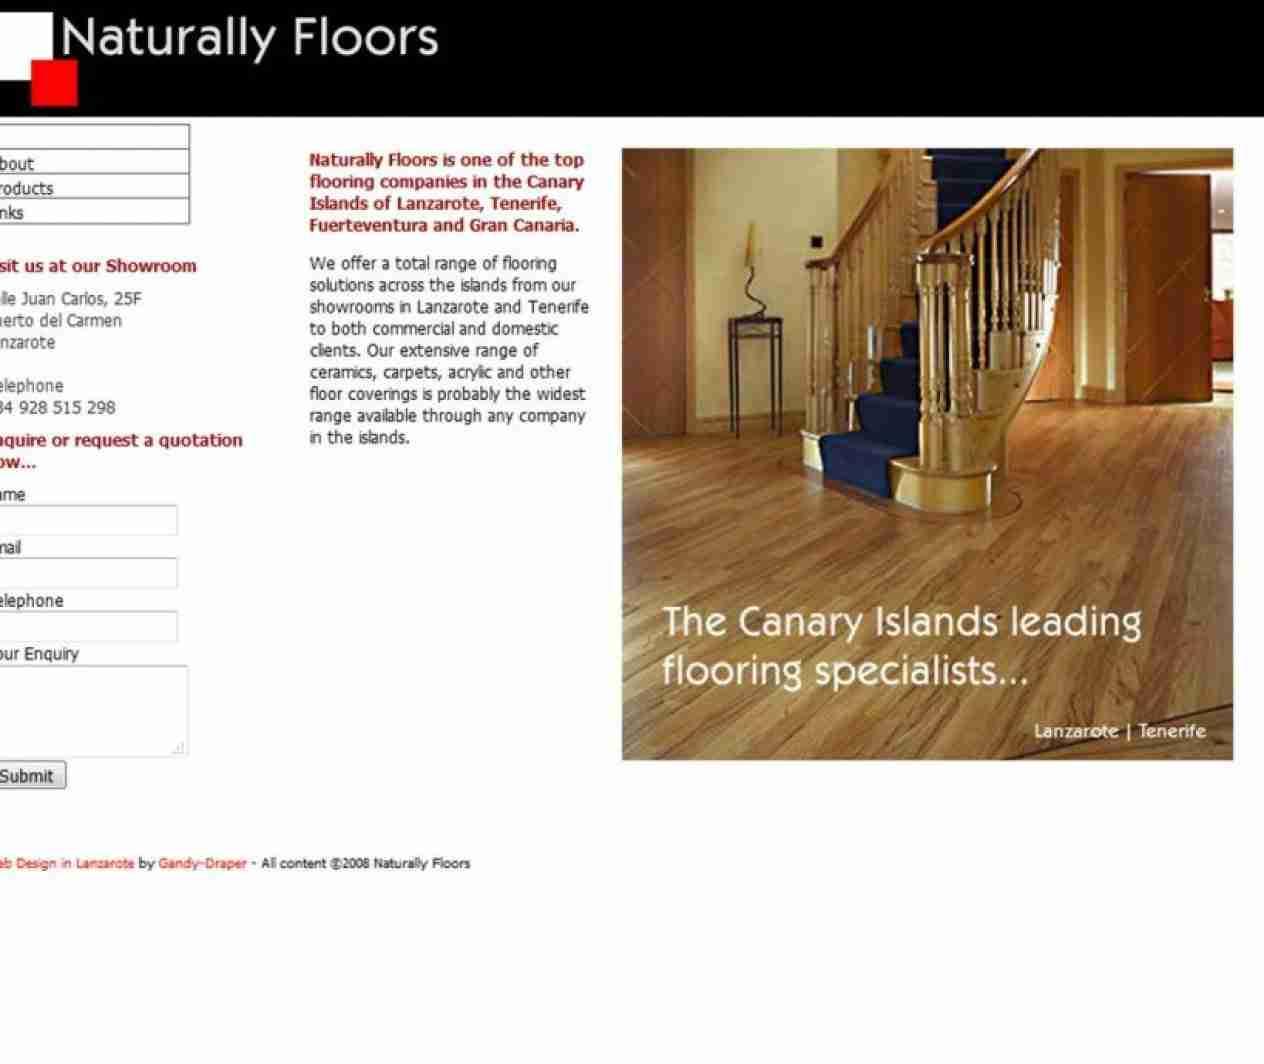 Naturally Floors